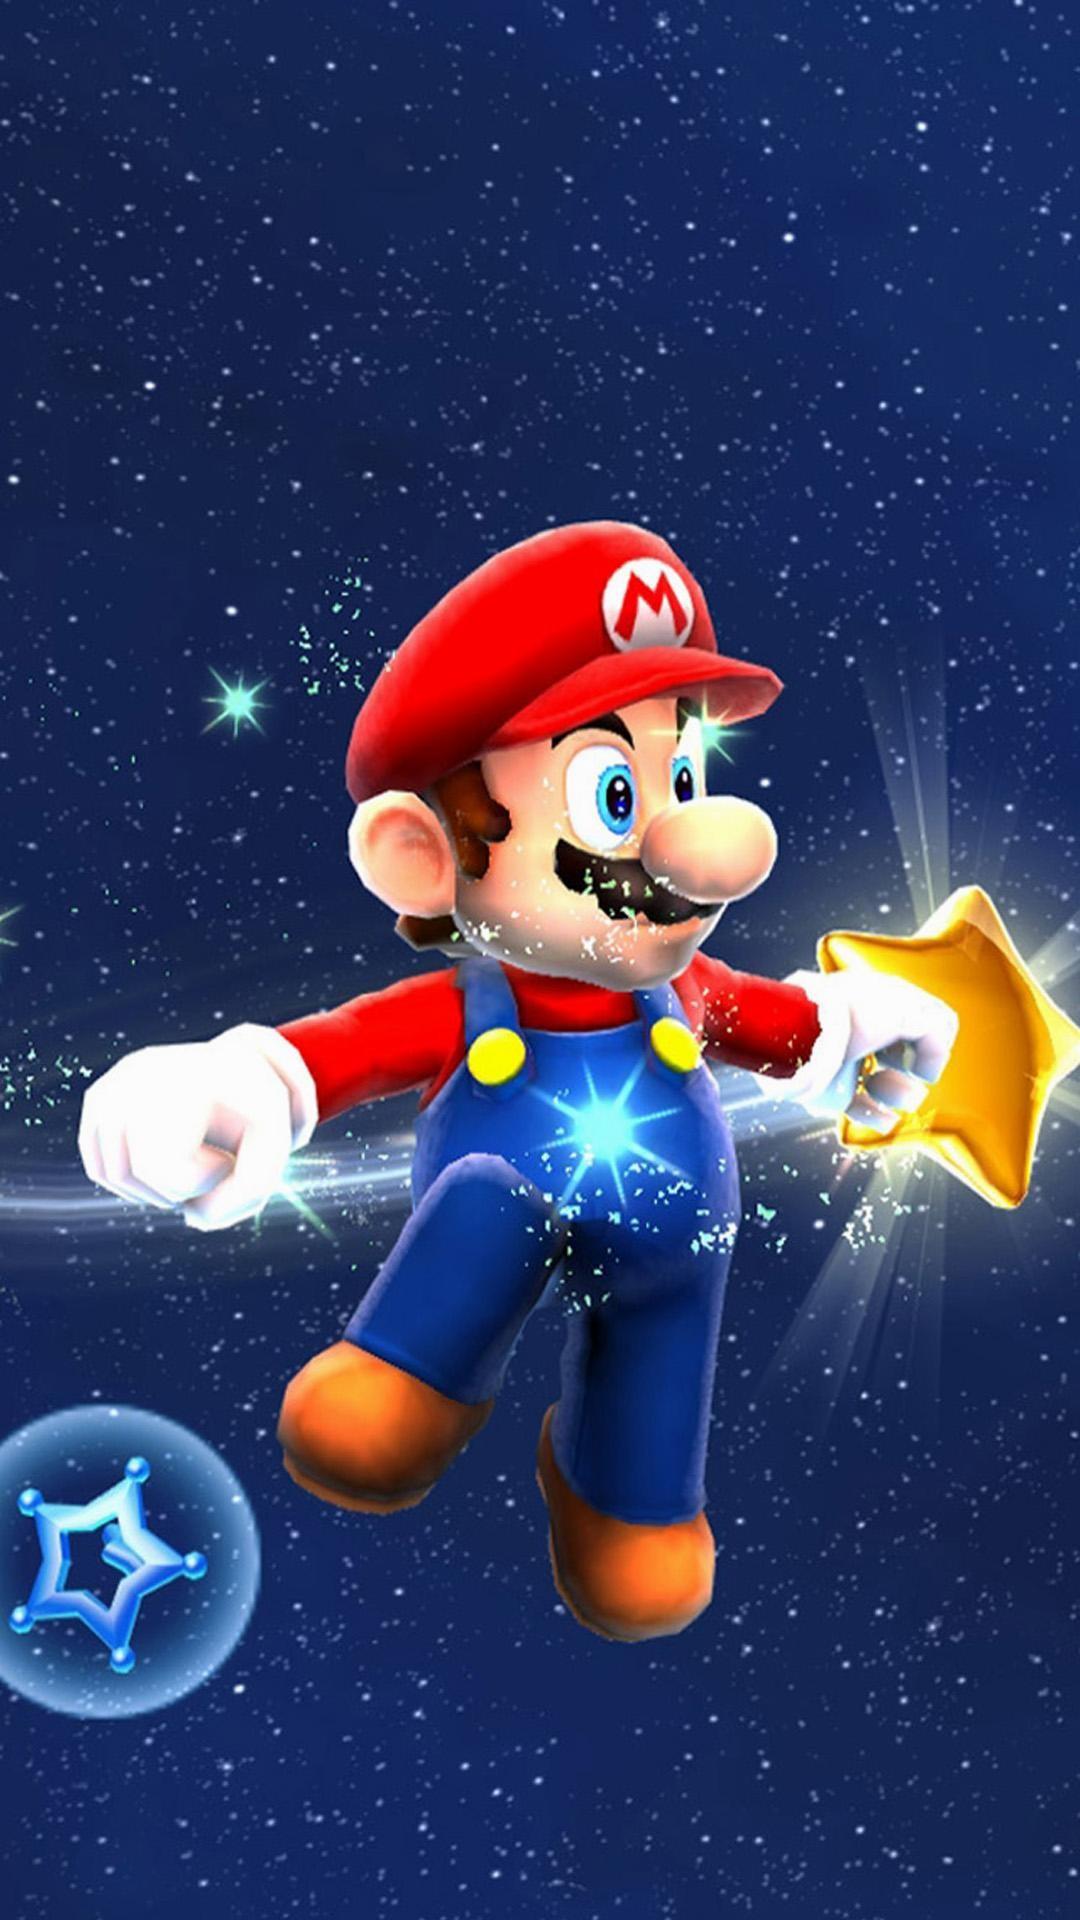 Super Mario Galaxy 2 Wallpaper Hd 77 Pictures